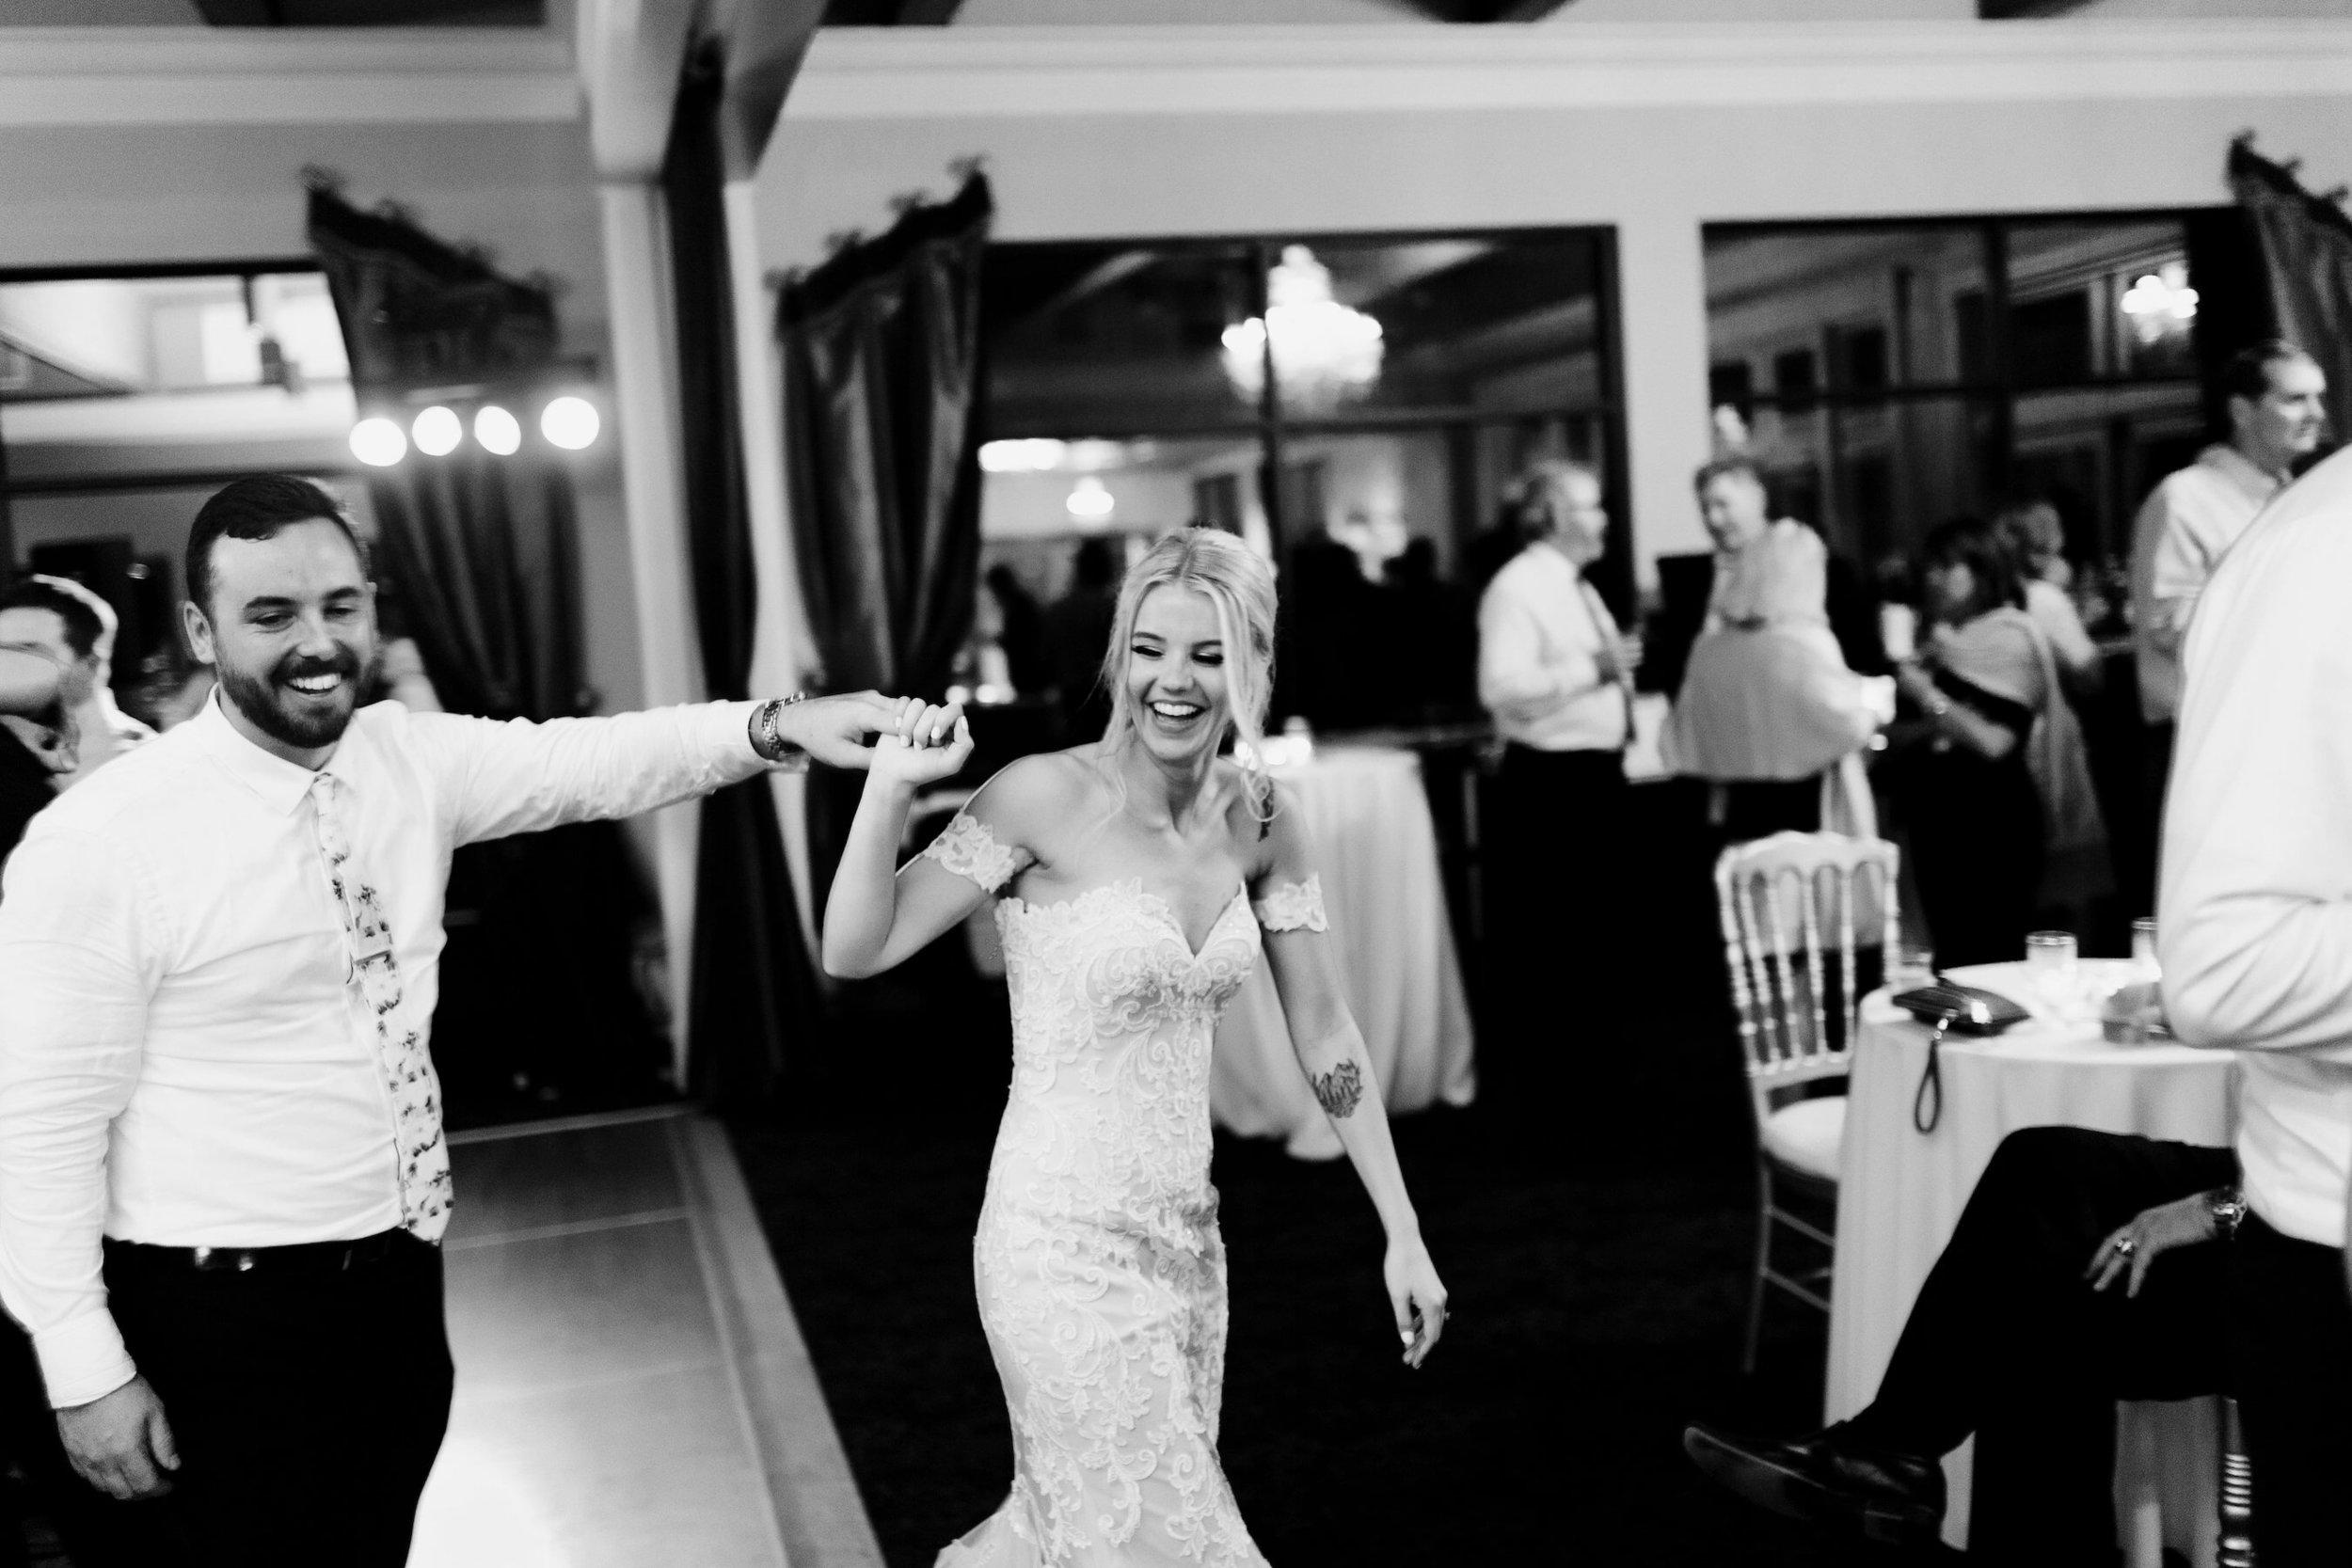 engle-olson-april-cj-wedding-jessica-holleque-21.jpg